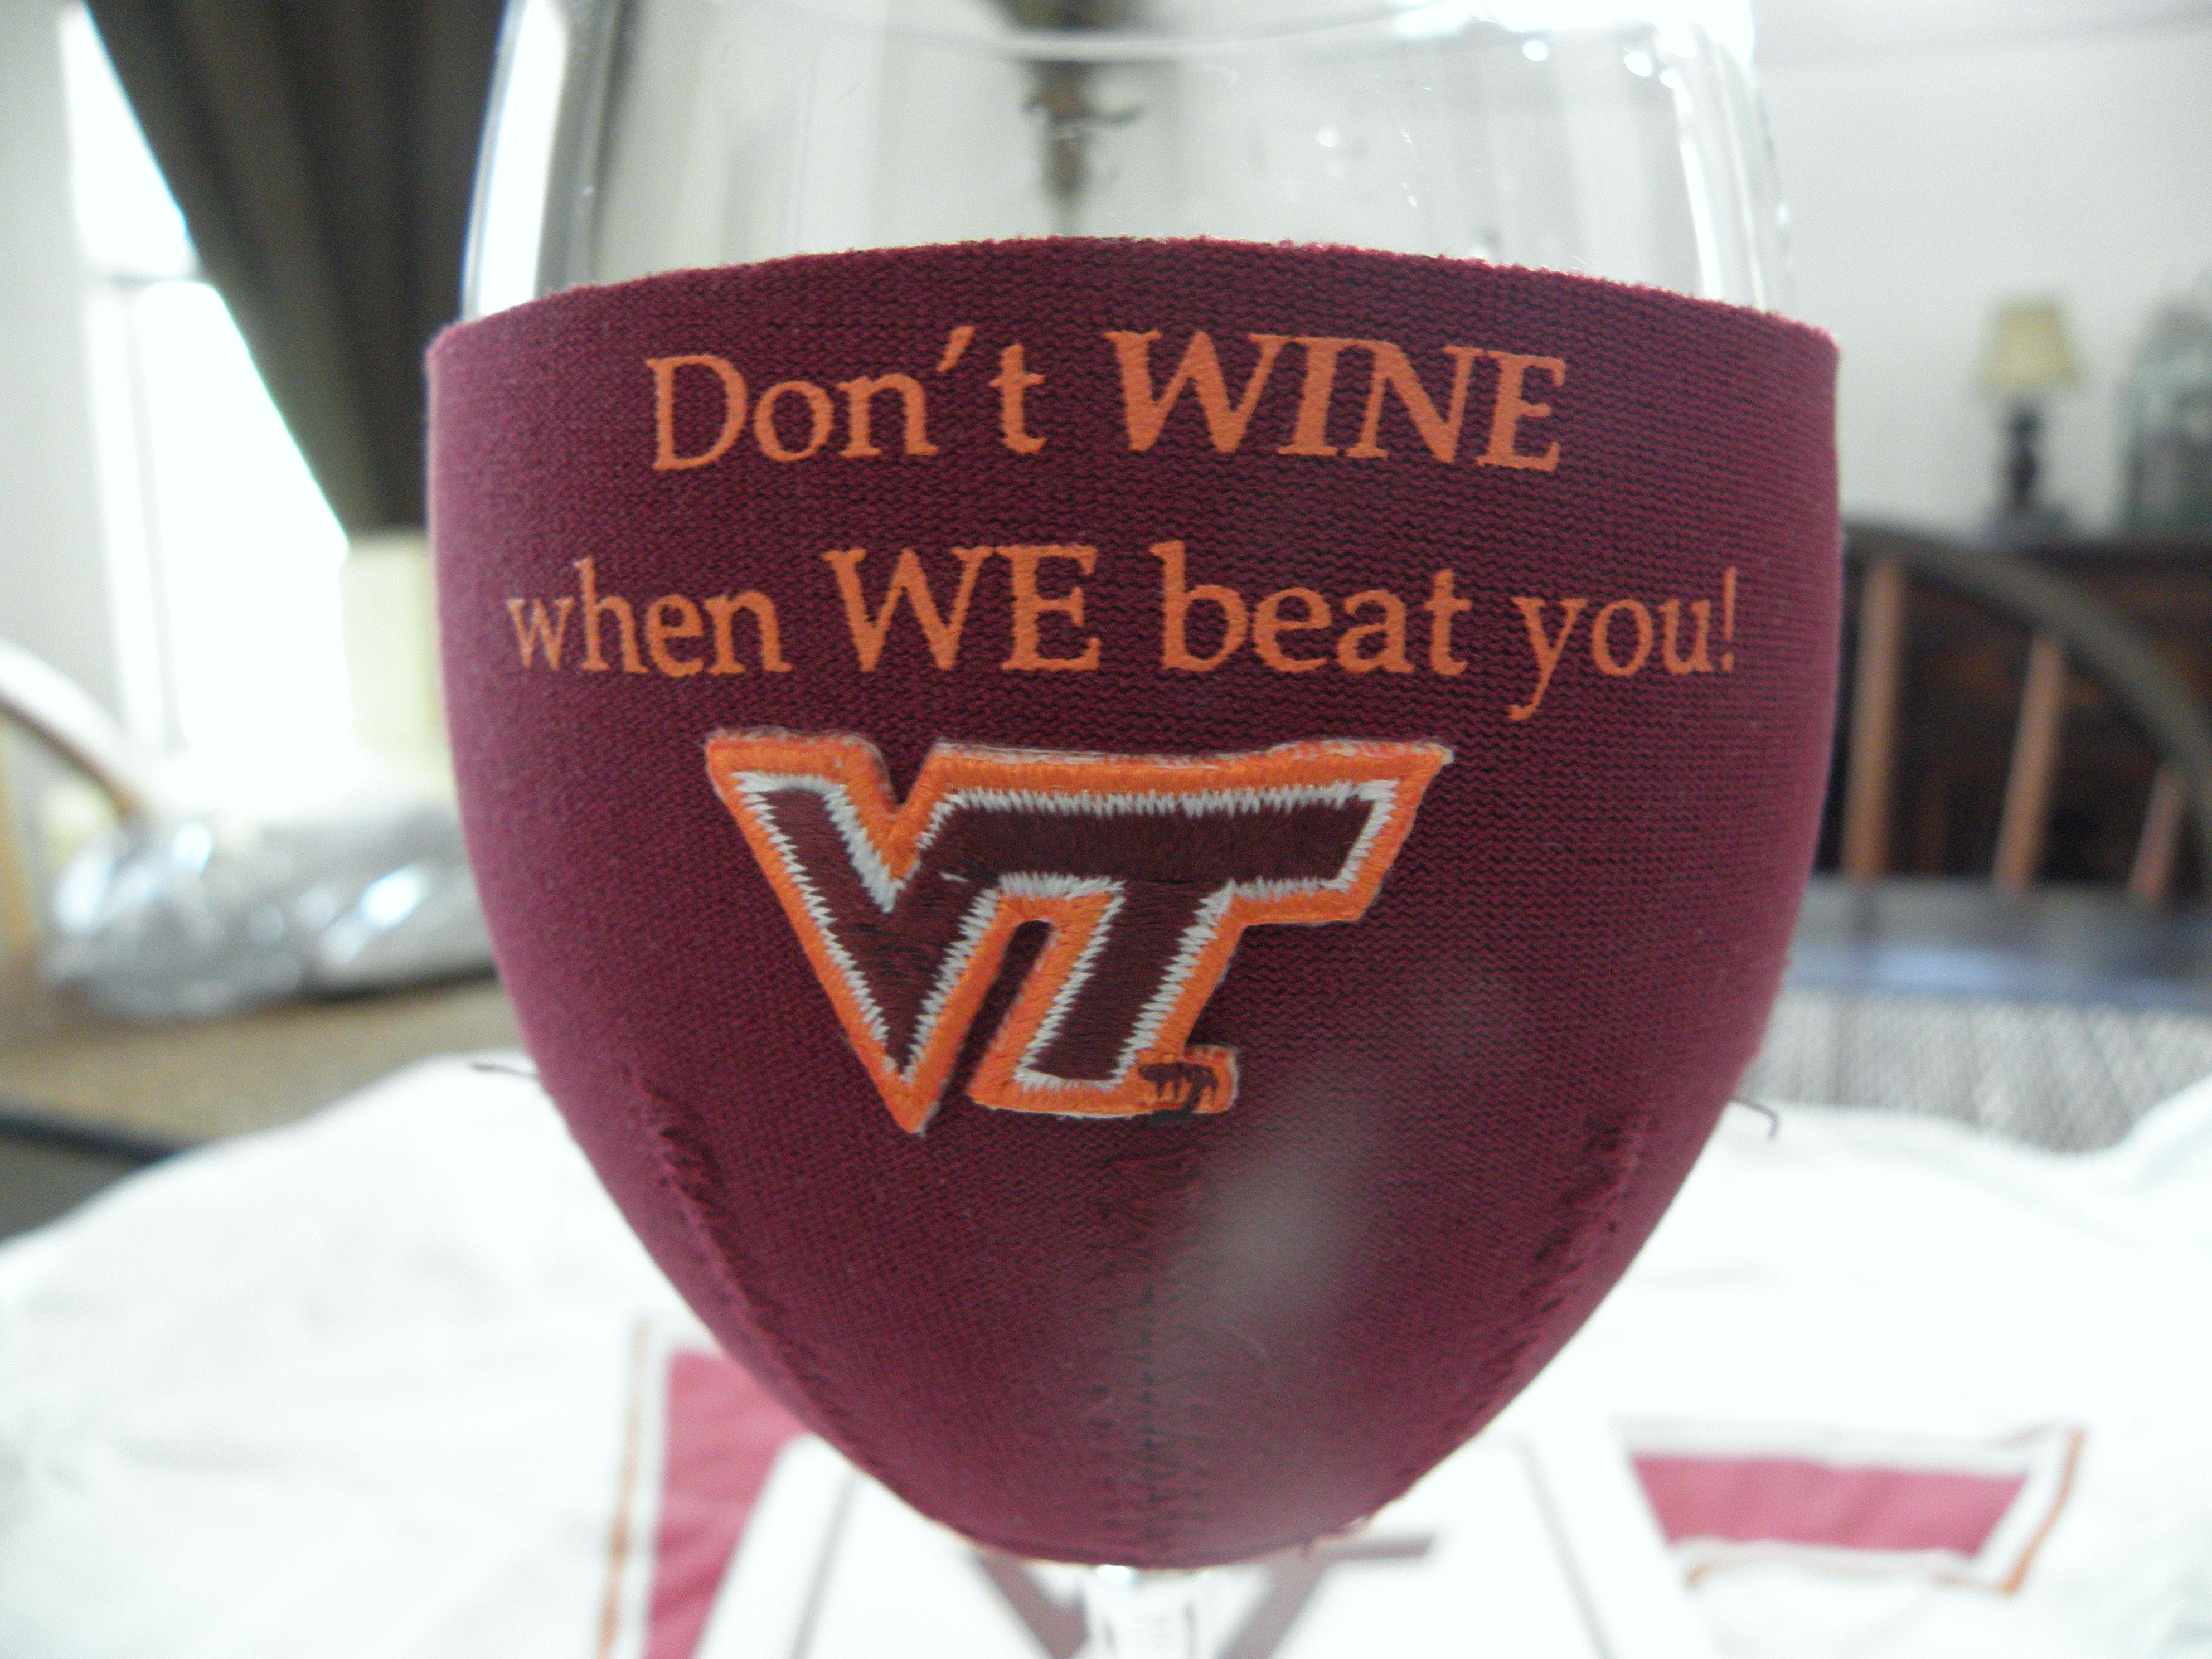 wine koozie Virginia tech football, Wine koozie